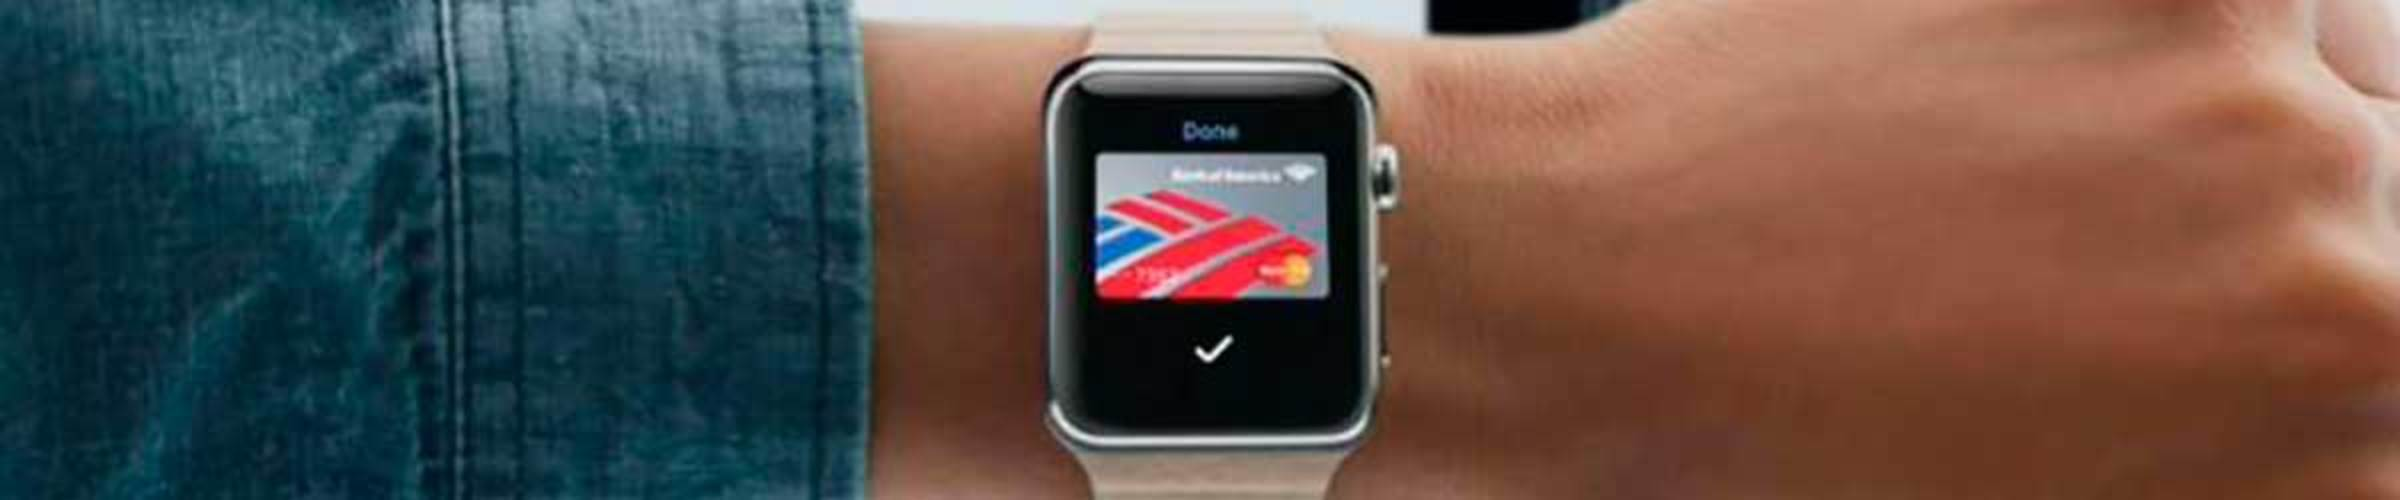 Apple Pay на Apple Watch: инструкция и оплата